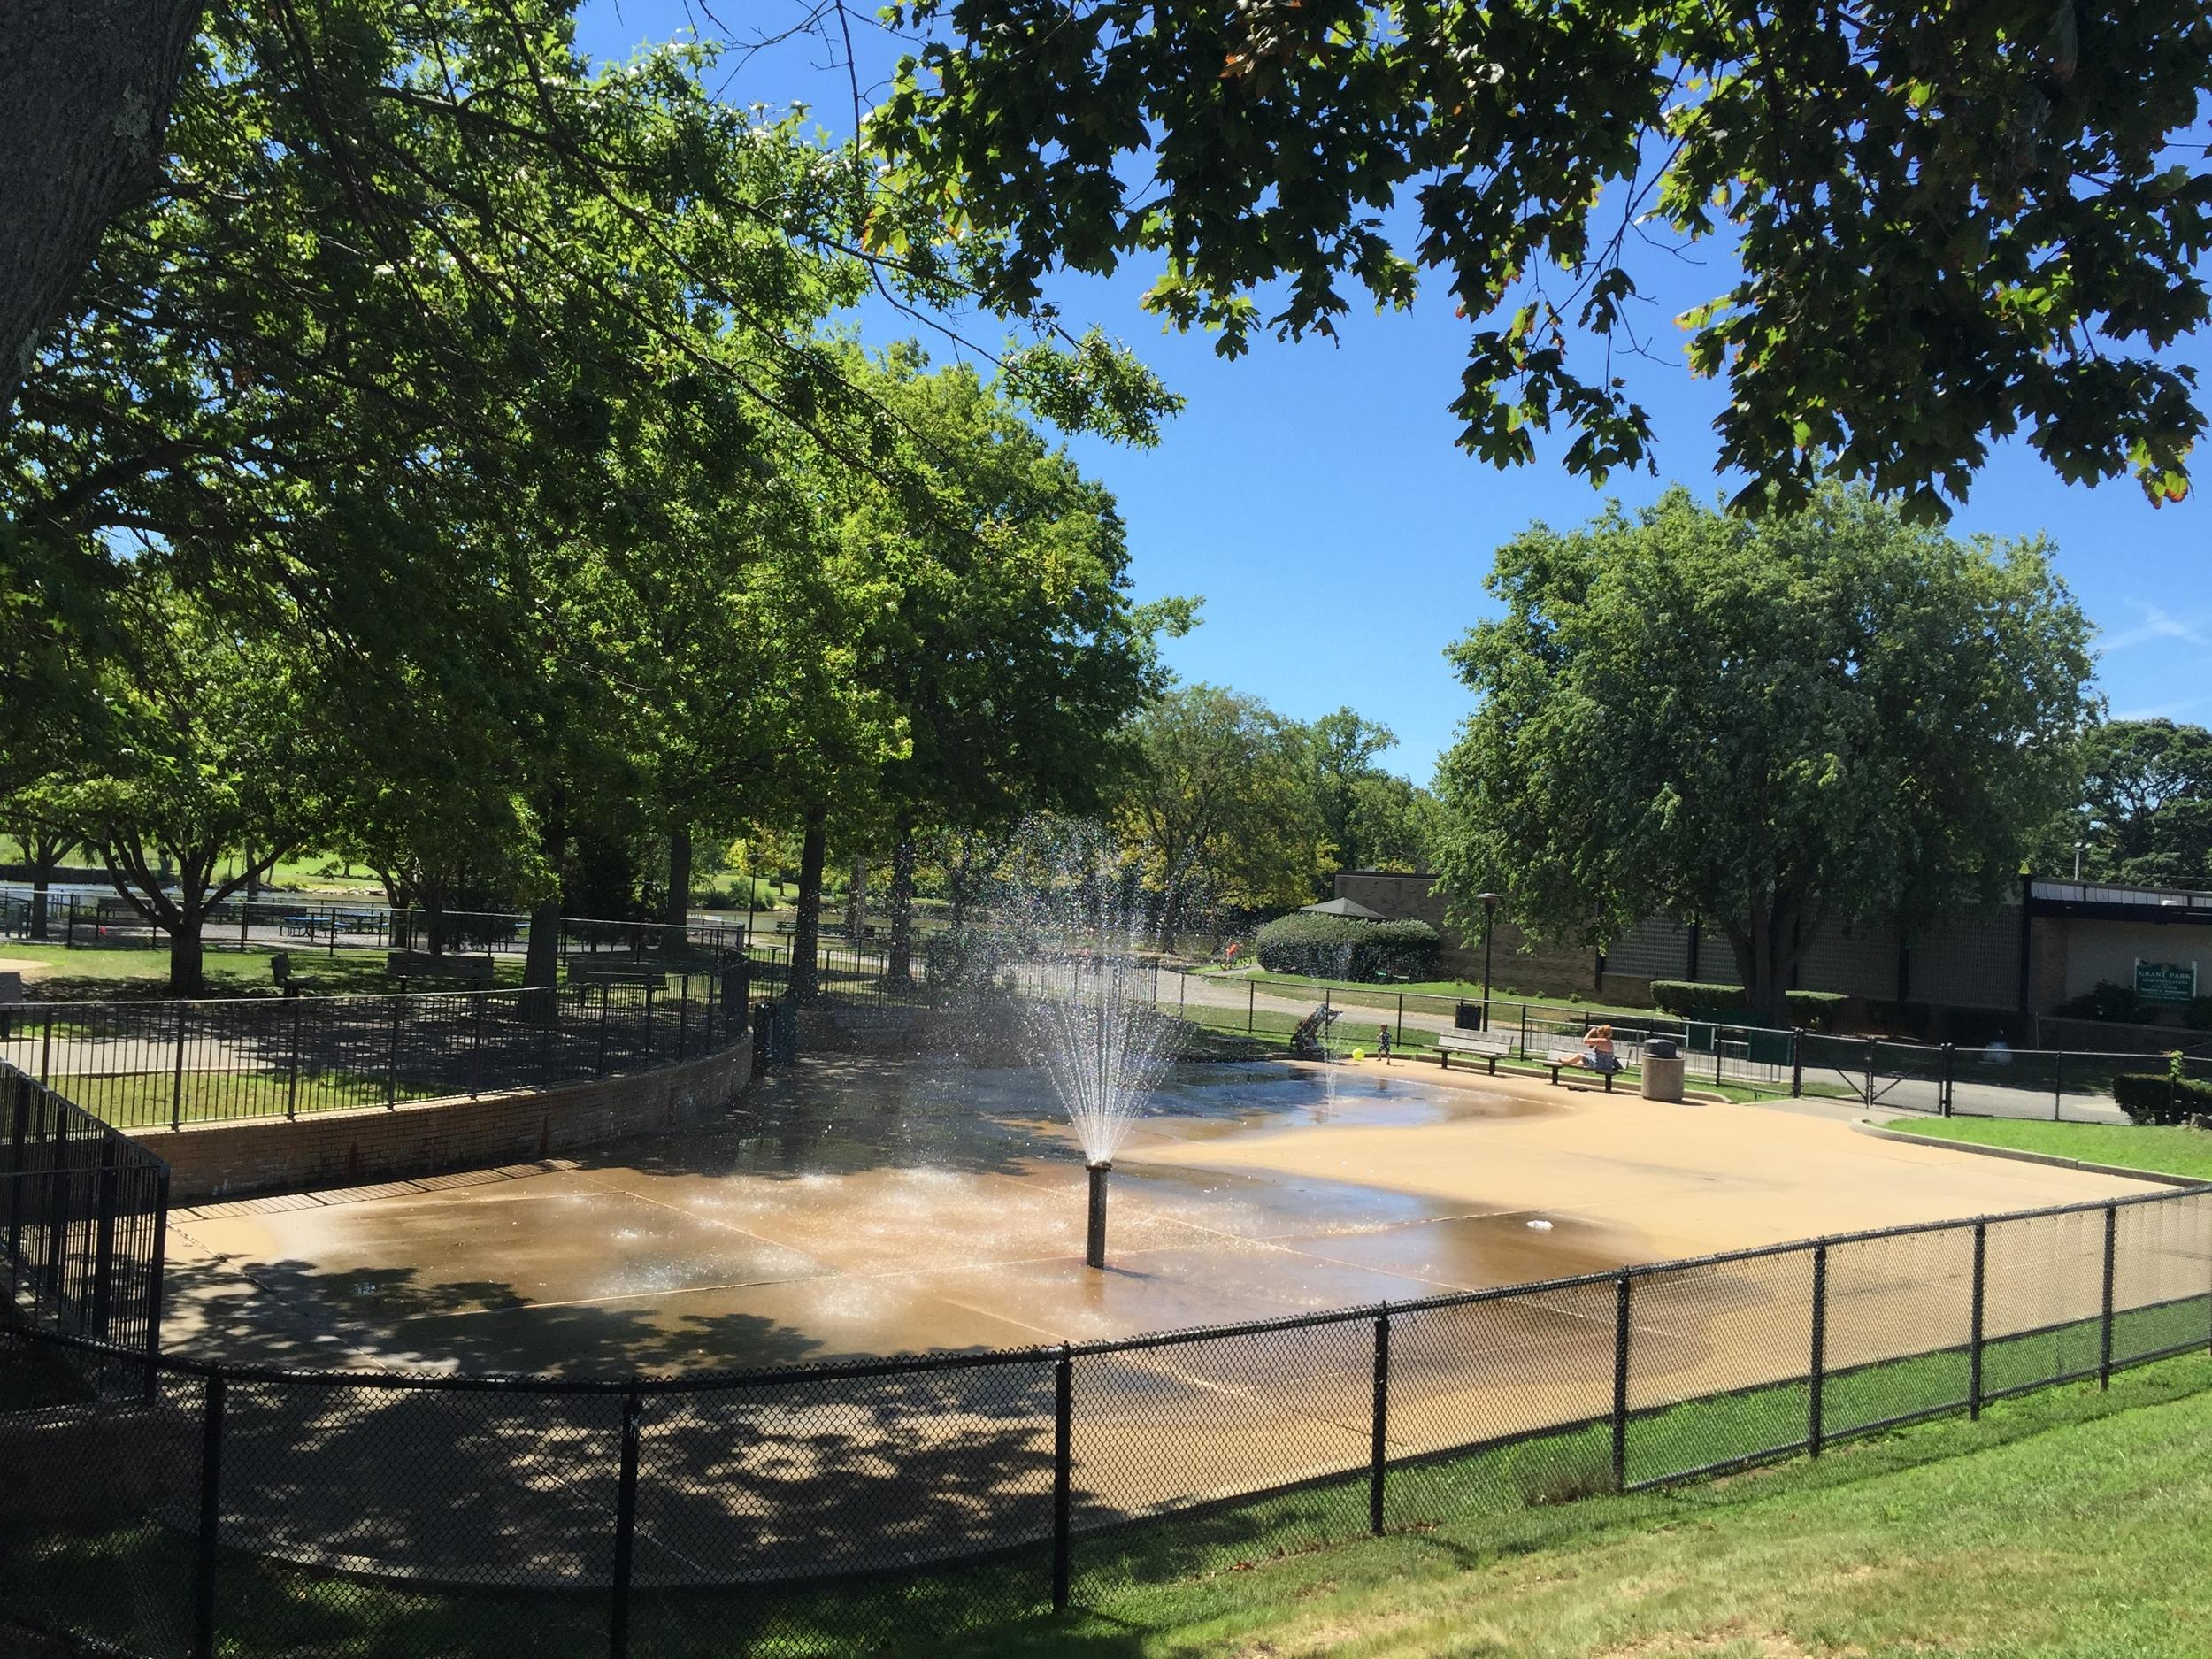 Sprayground at Grant Park